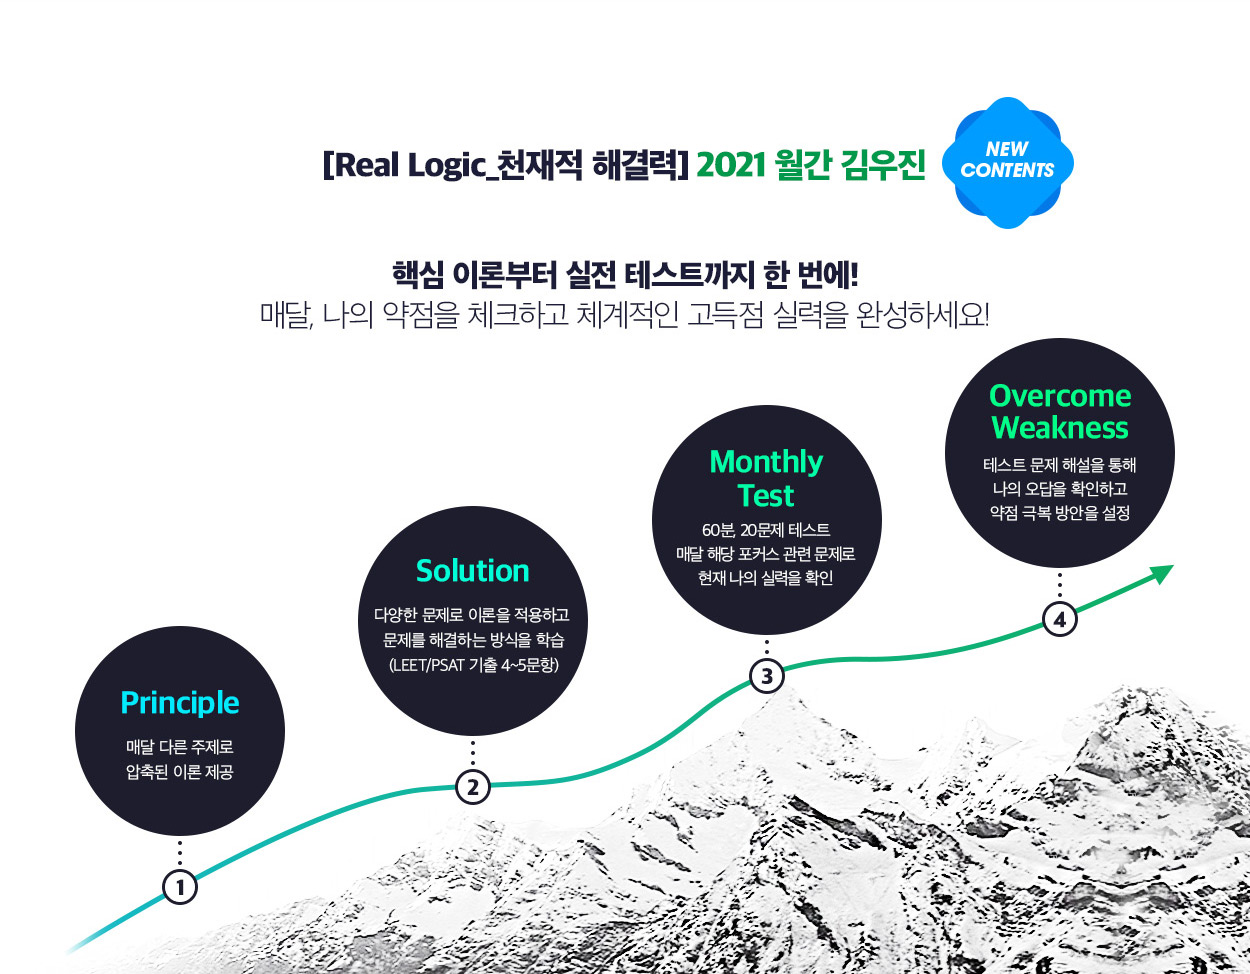 [Real Logic_천재적 해결력] 2021 월간 김우진